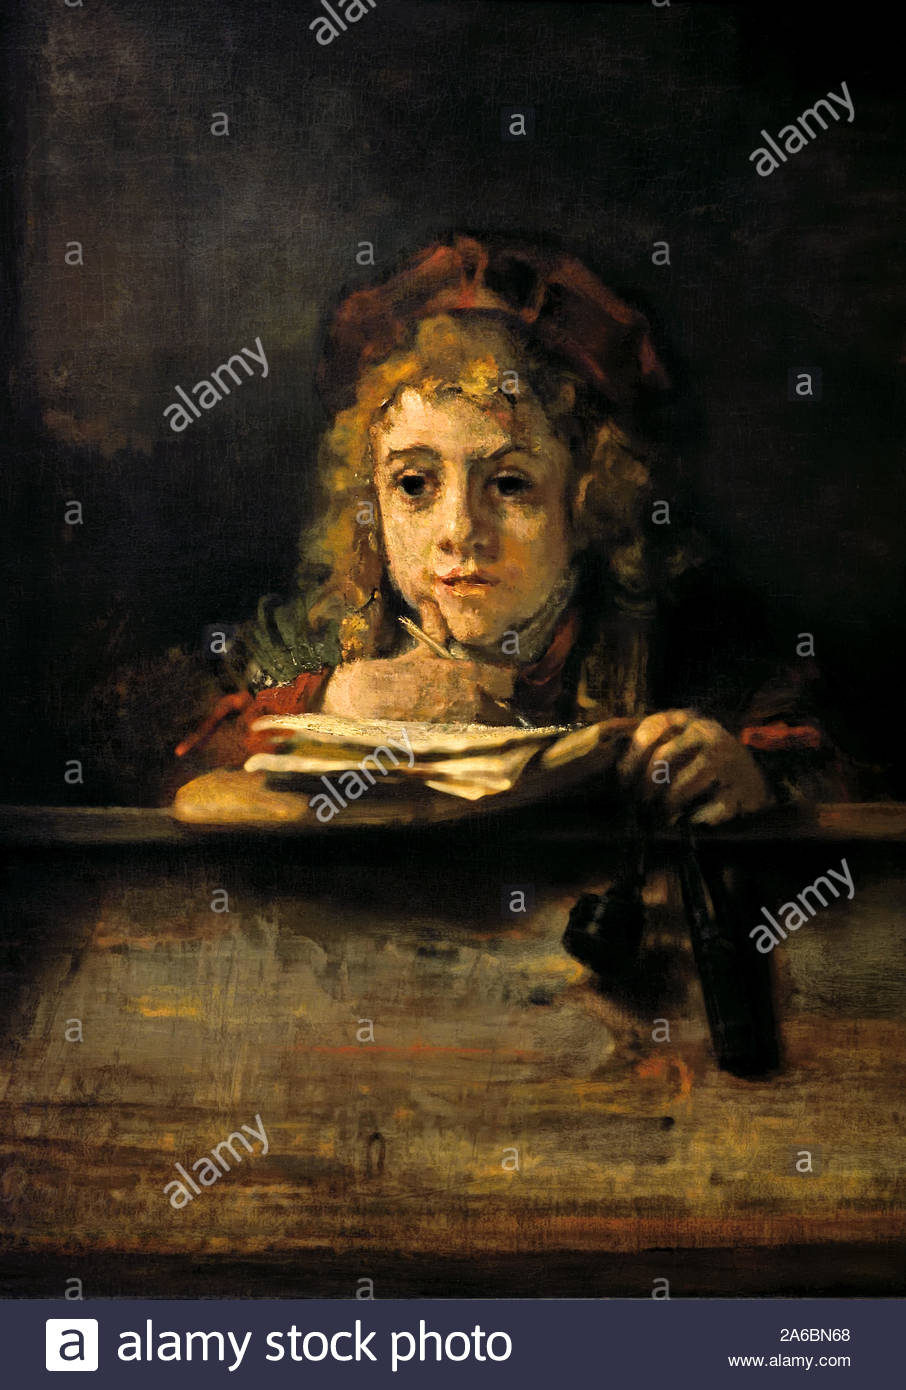 Rembrandt Harmenszoon van Rijn Lion Resting Sketch Vintage Print